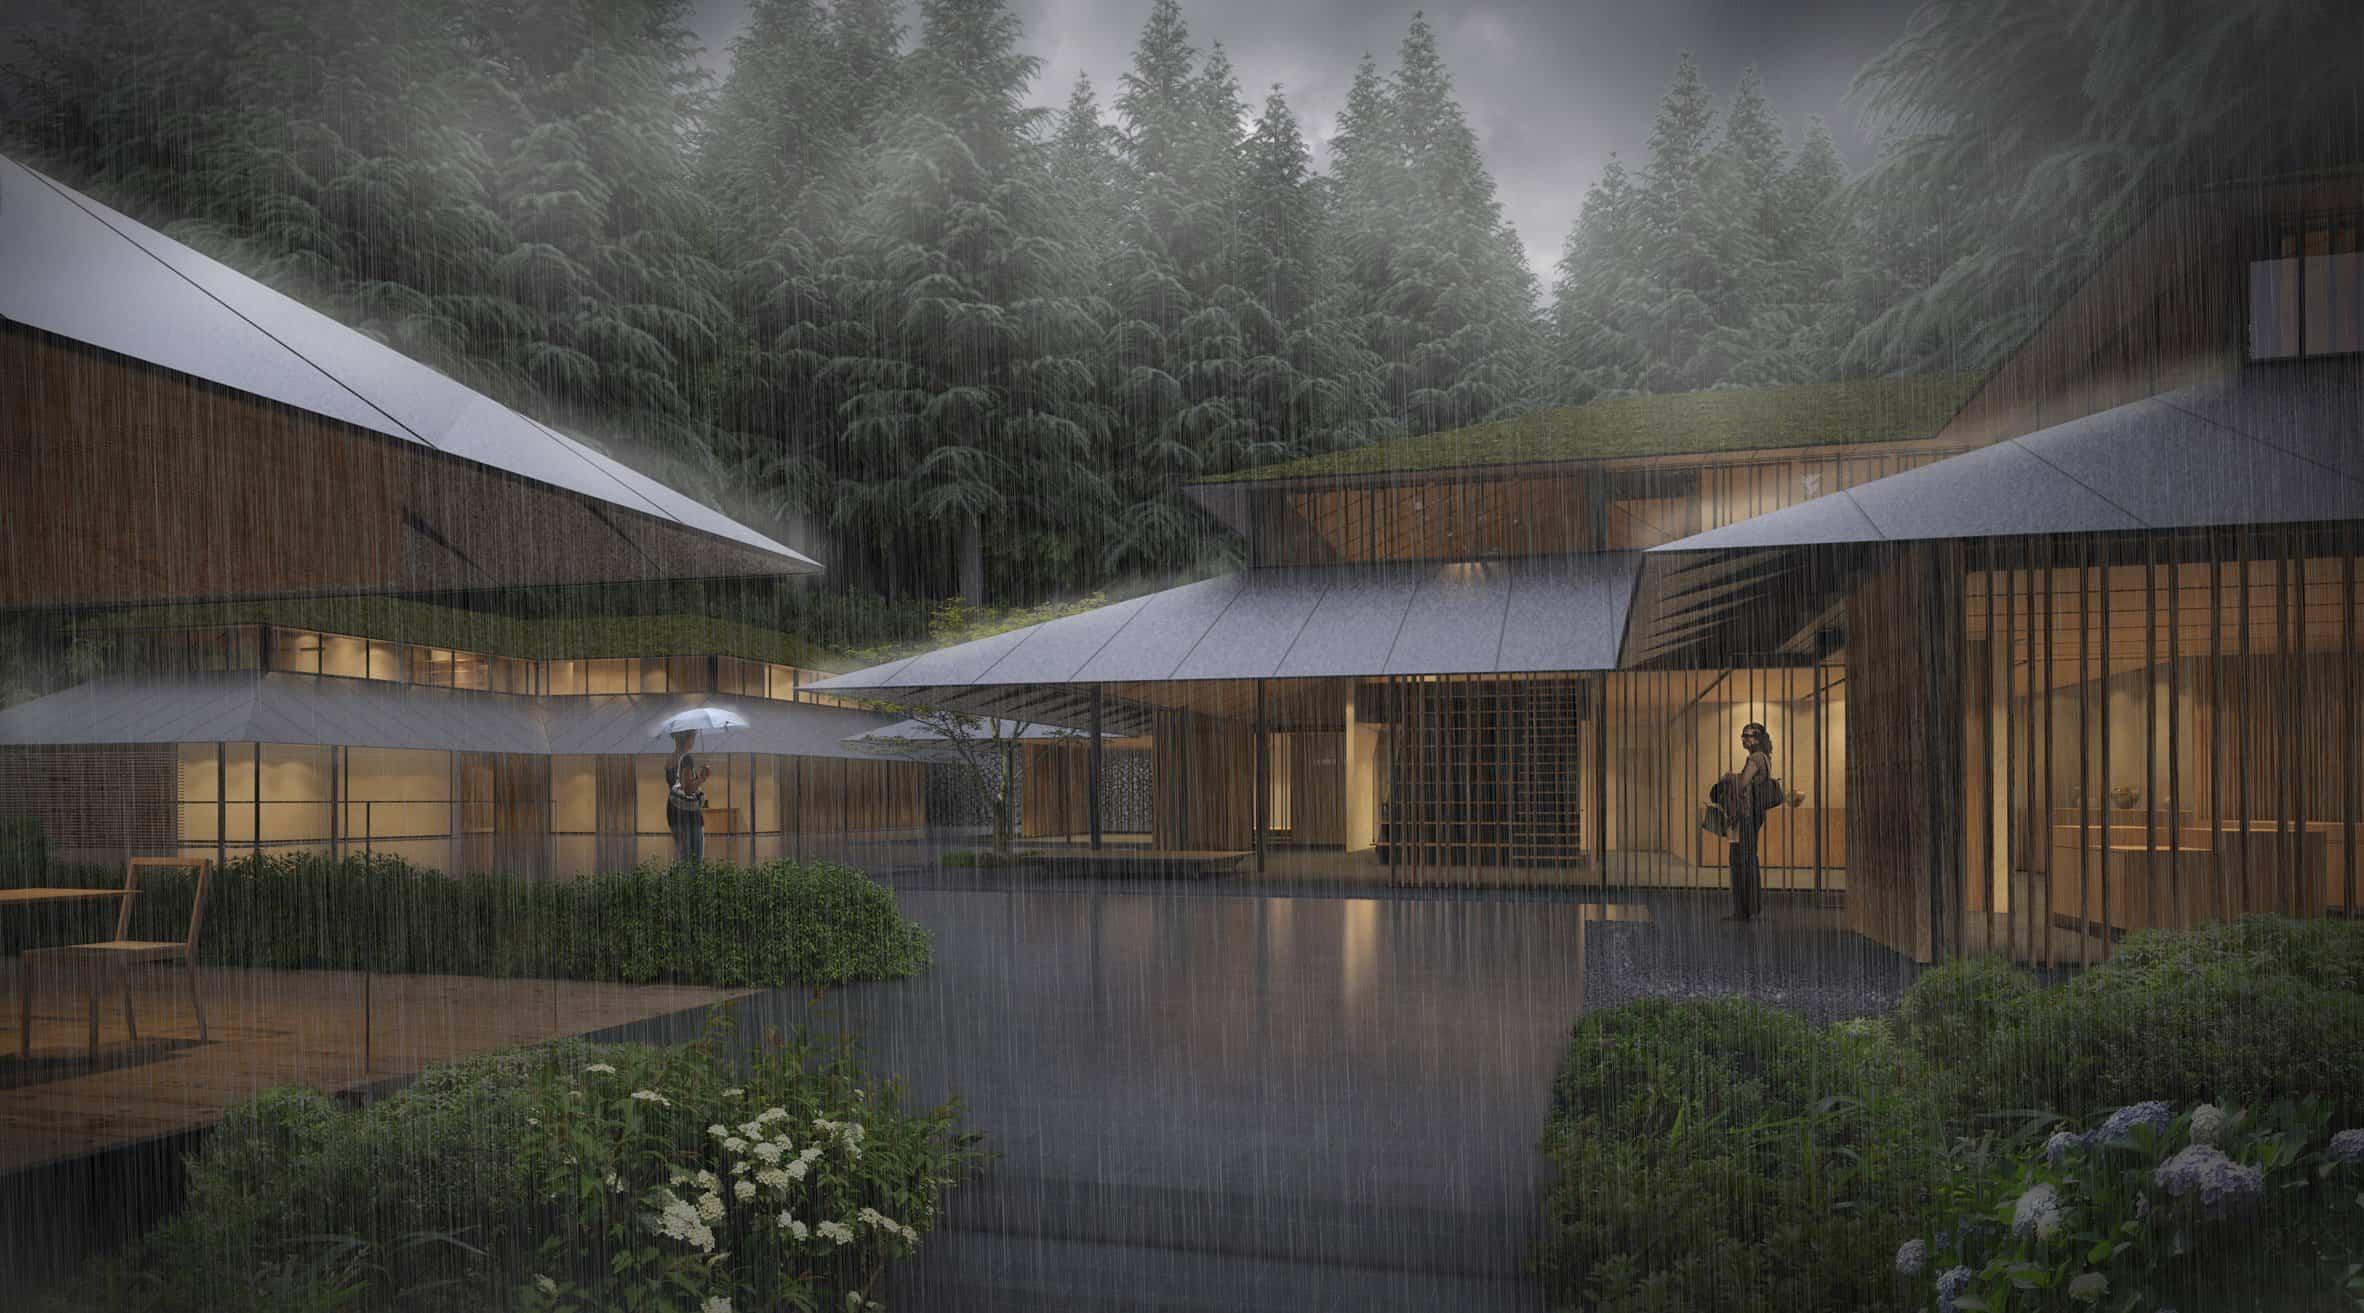 jardín japonés Kengo Kuma 4